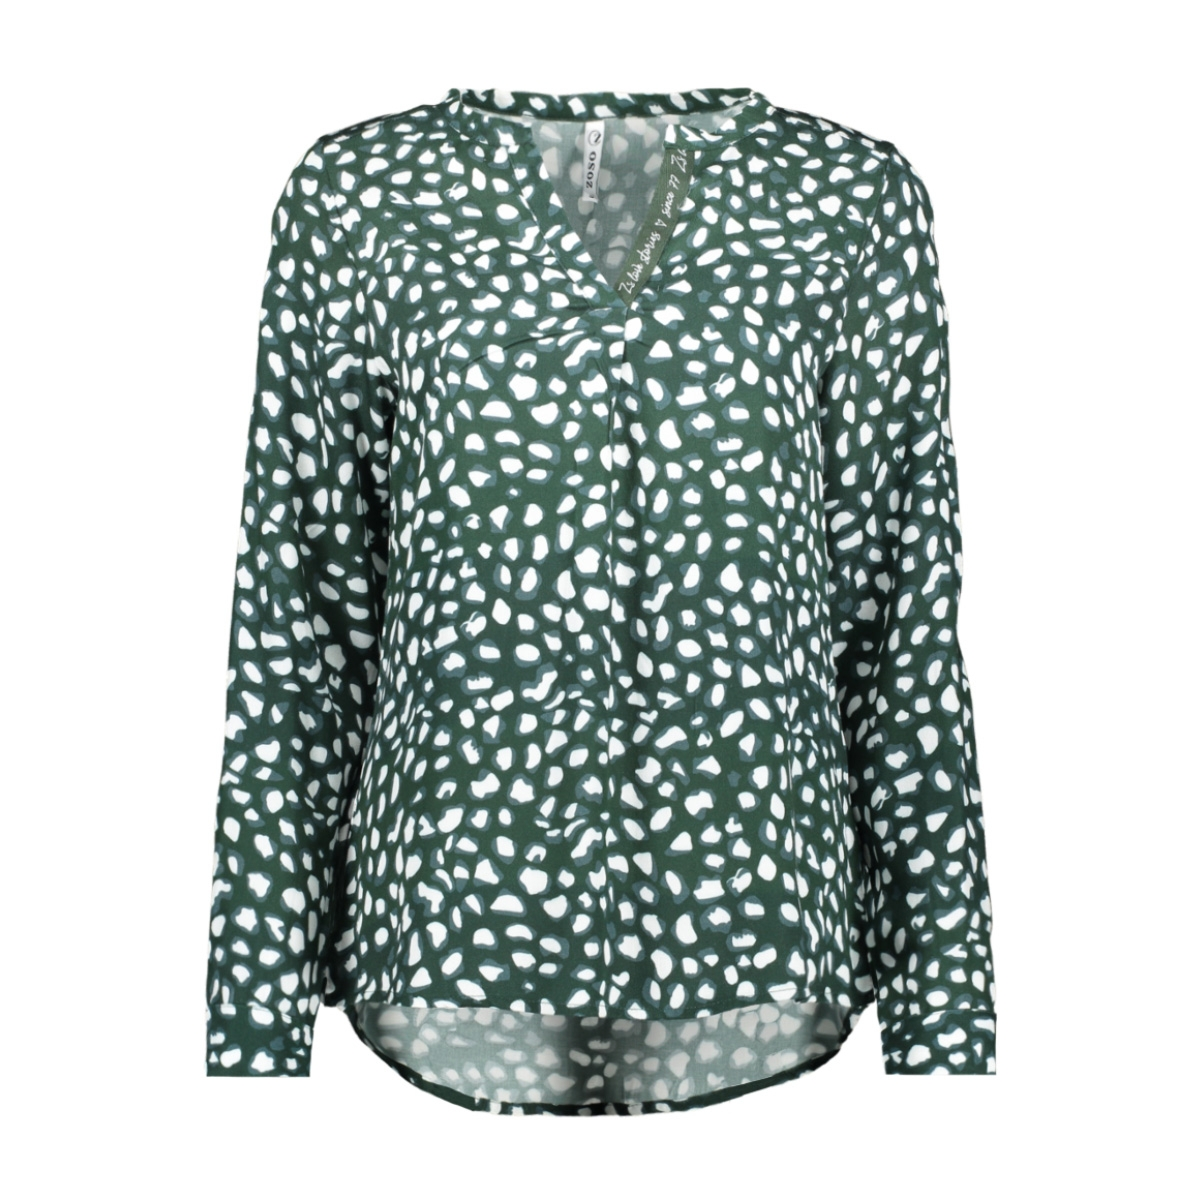 esra allover printed blouse 195 zoso blouse forest midgreen